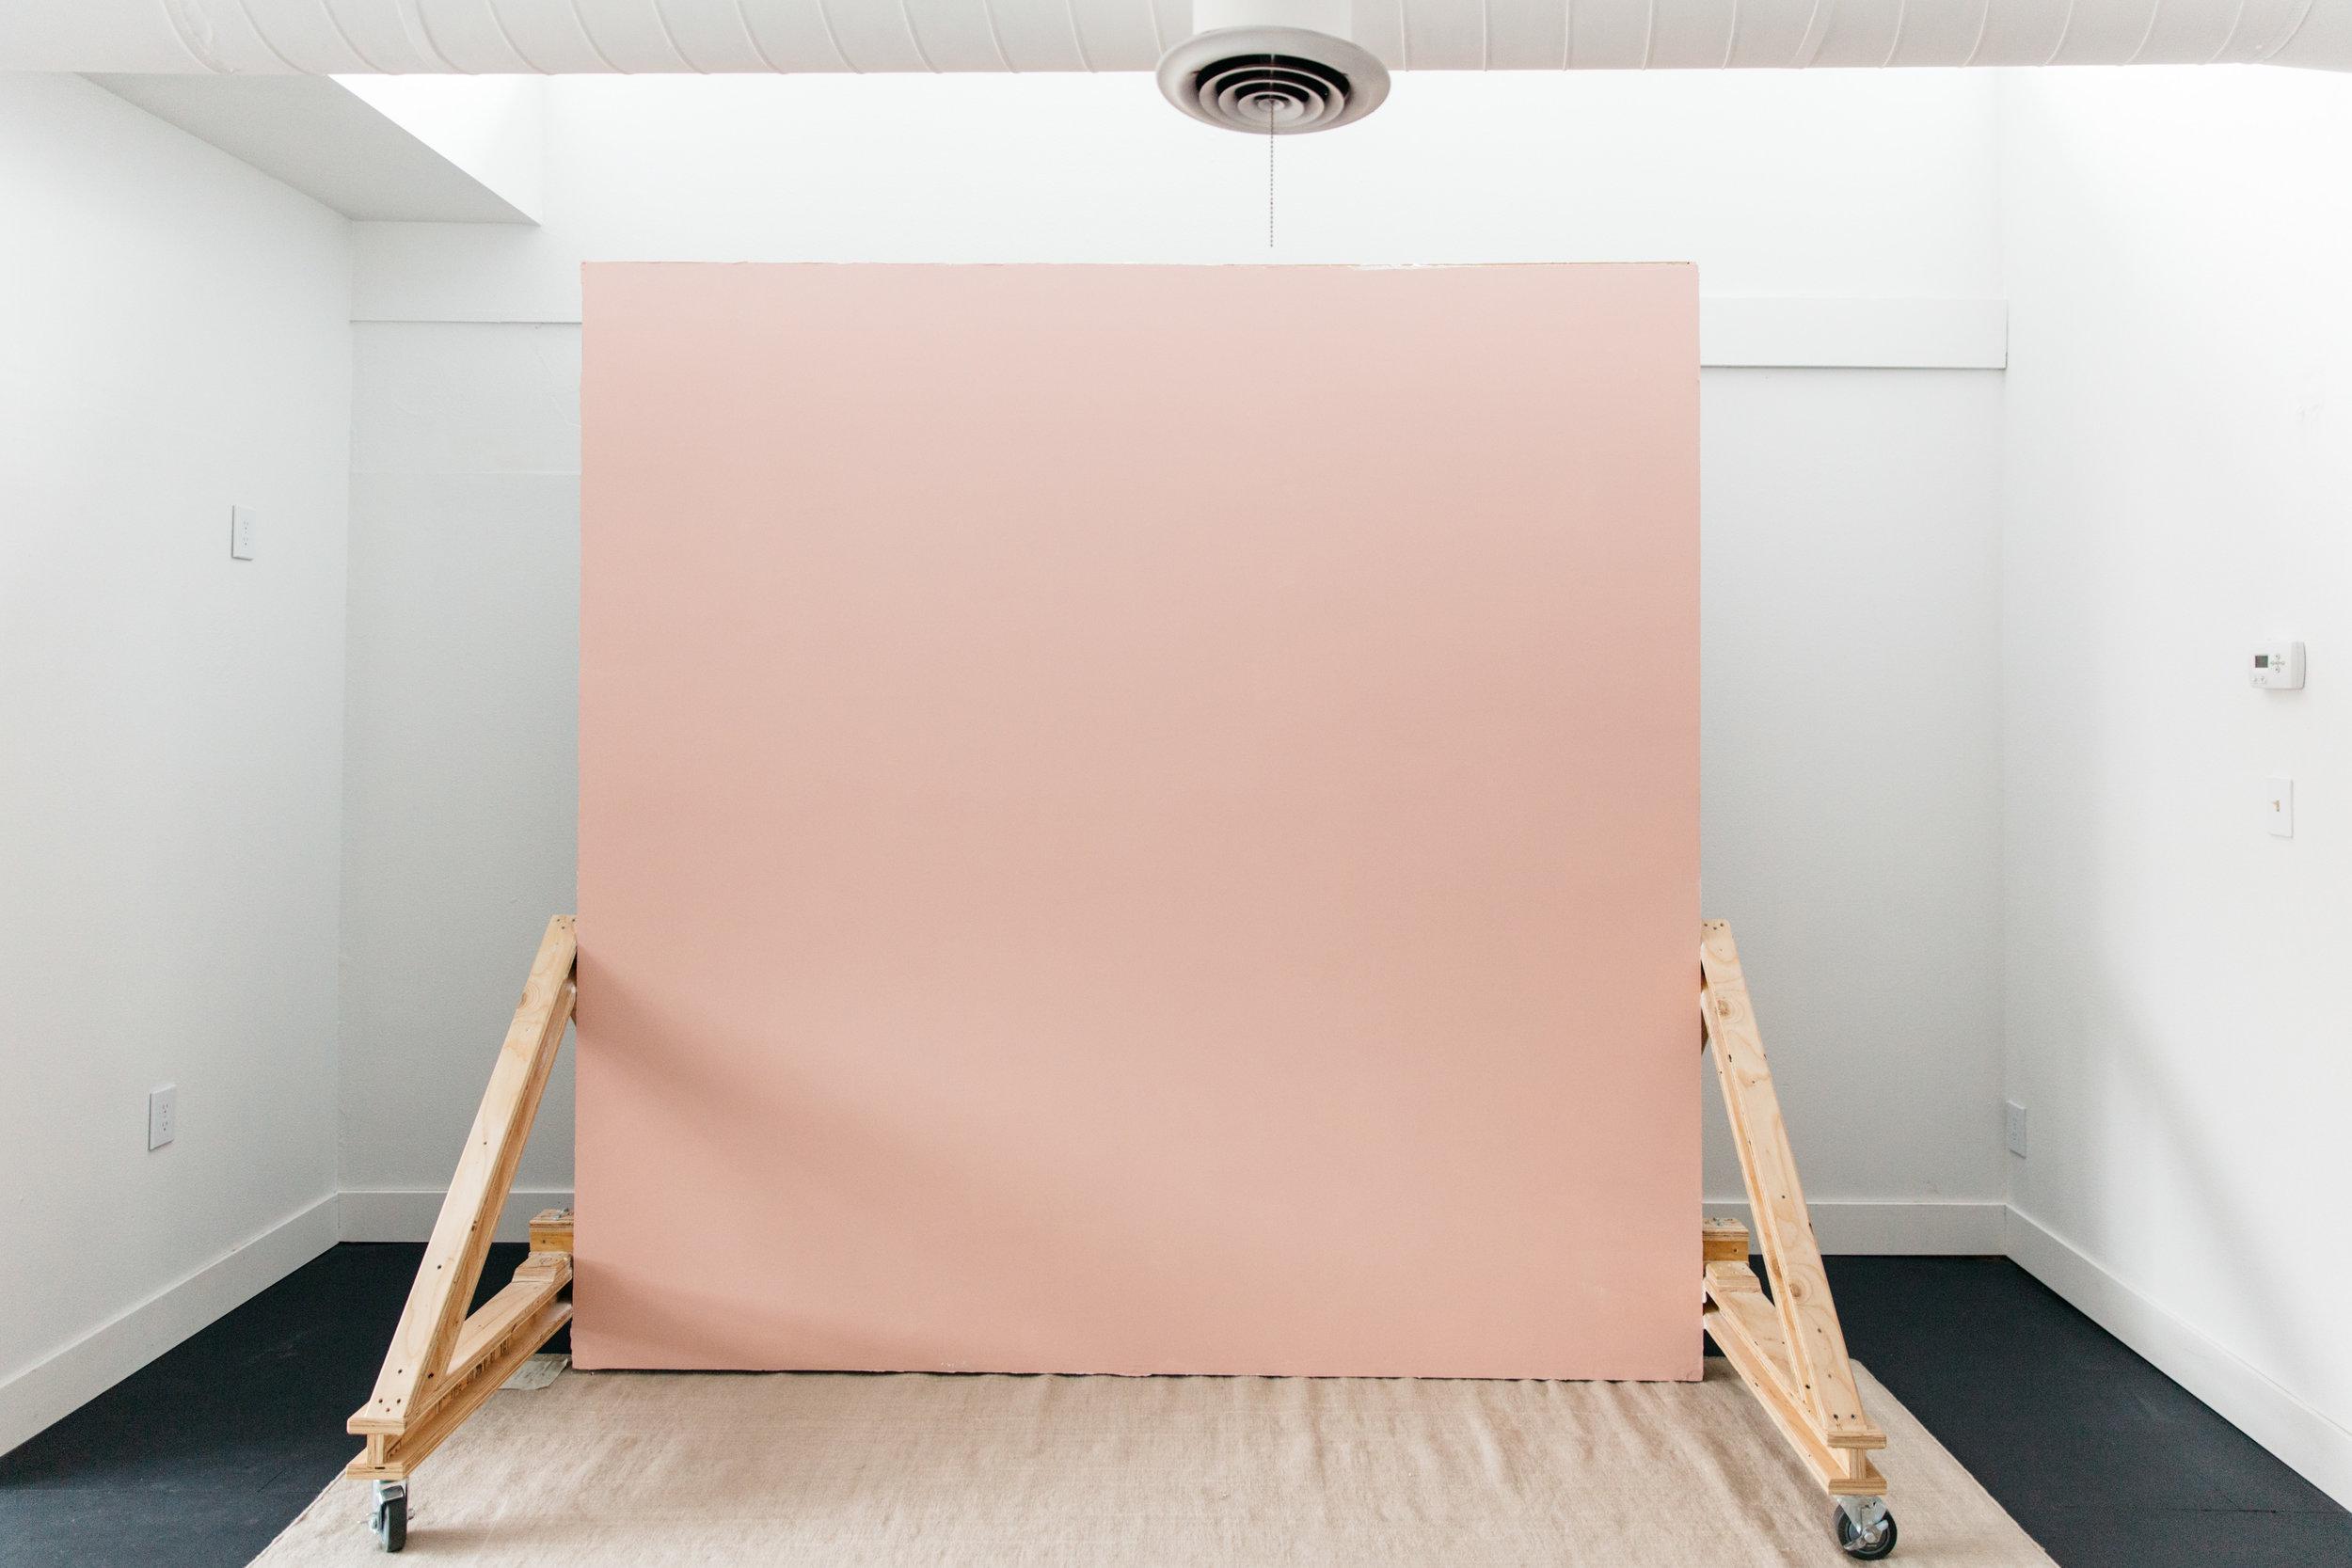 colorado-springs-photography-rental-studio-38.jpg